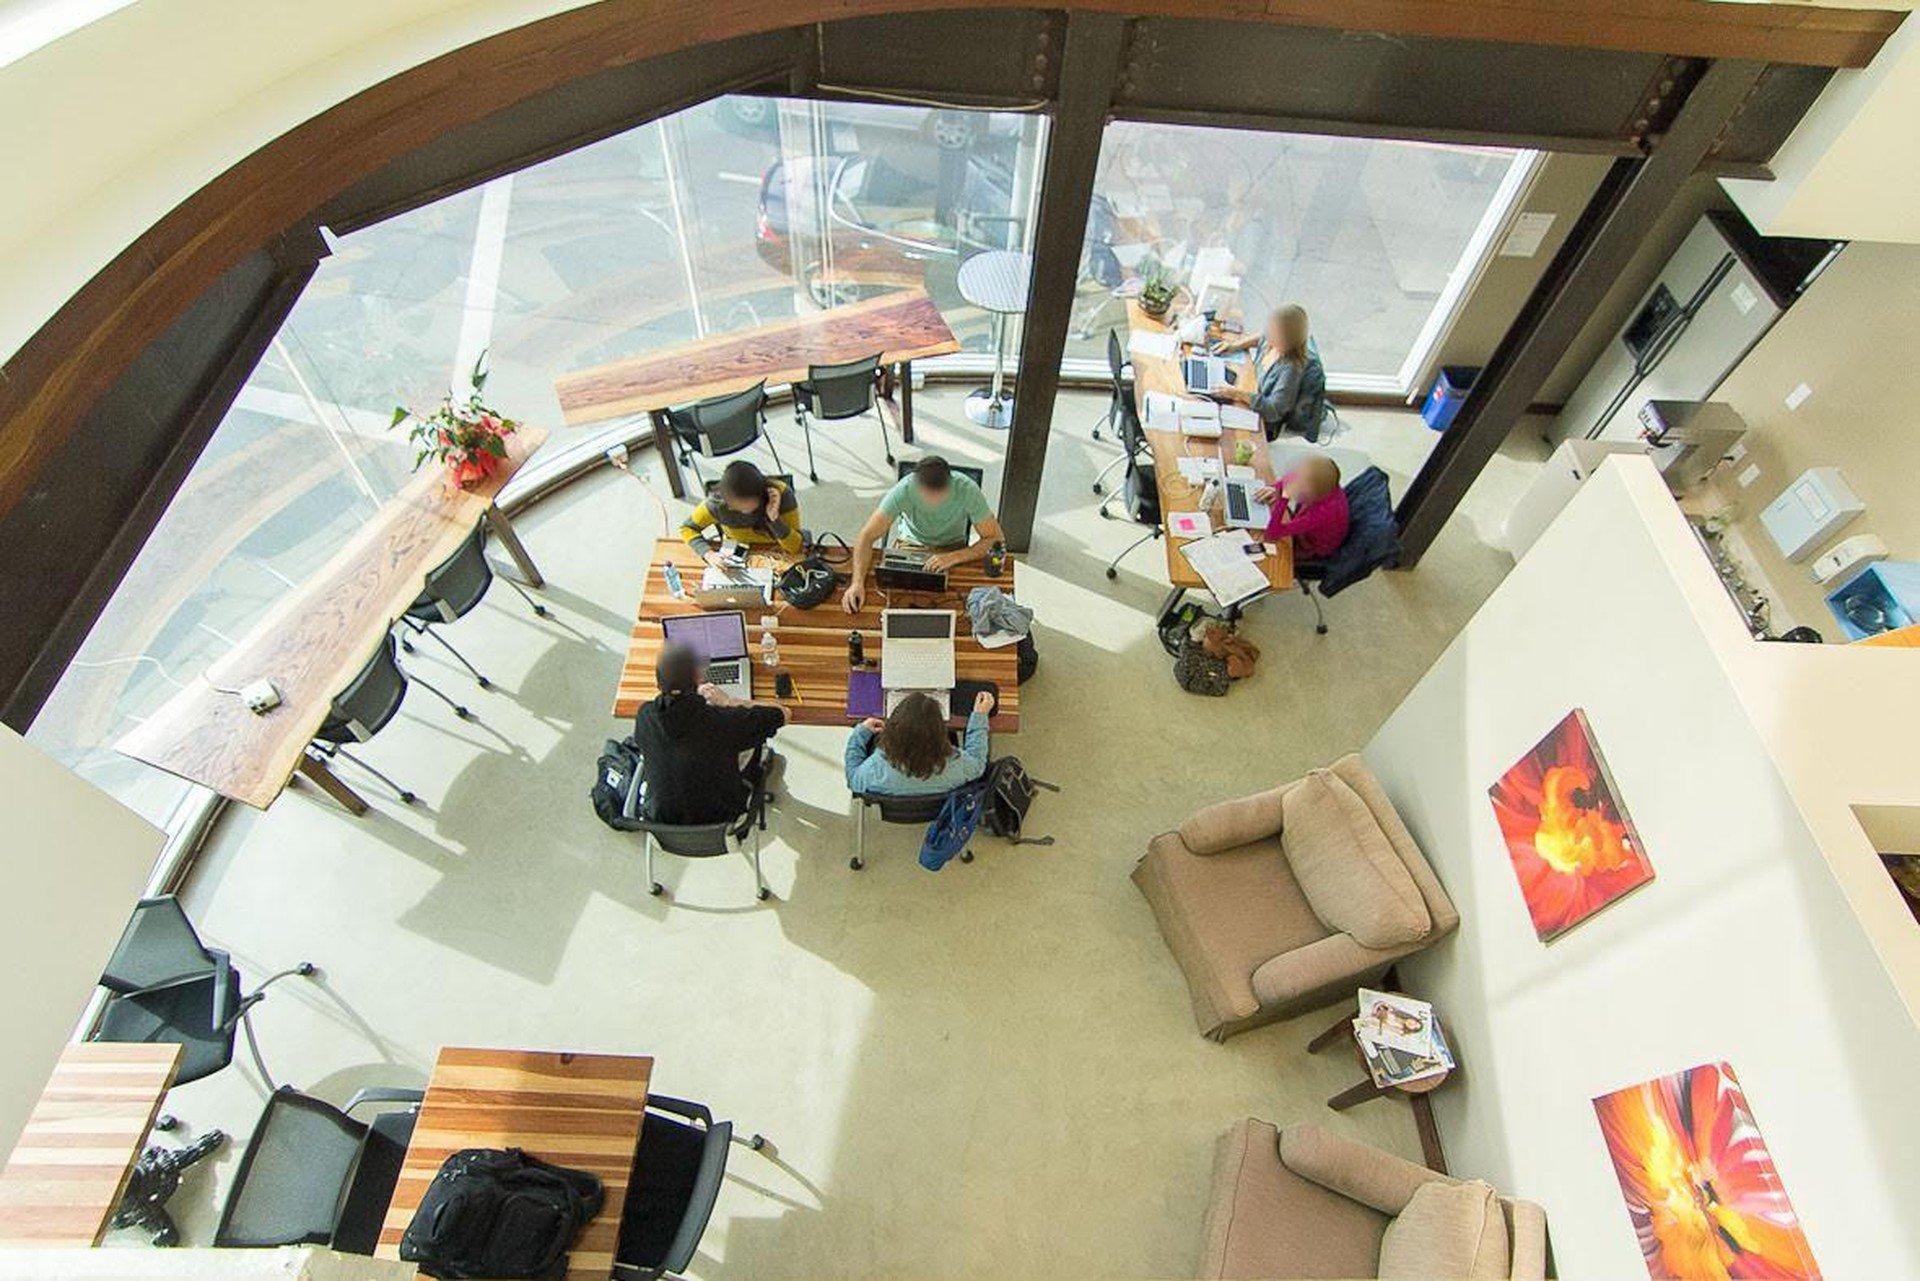 Autres villes conference rooms Lieu Atypique Satellite Inc - Conference Room image 0